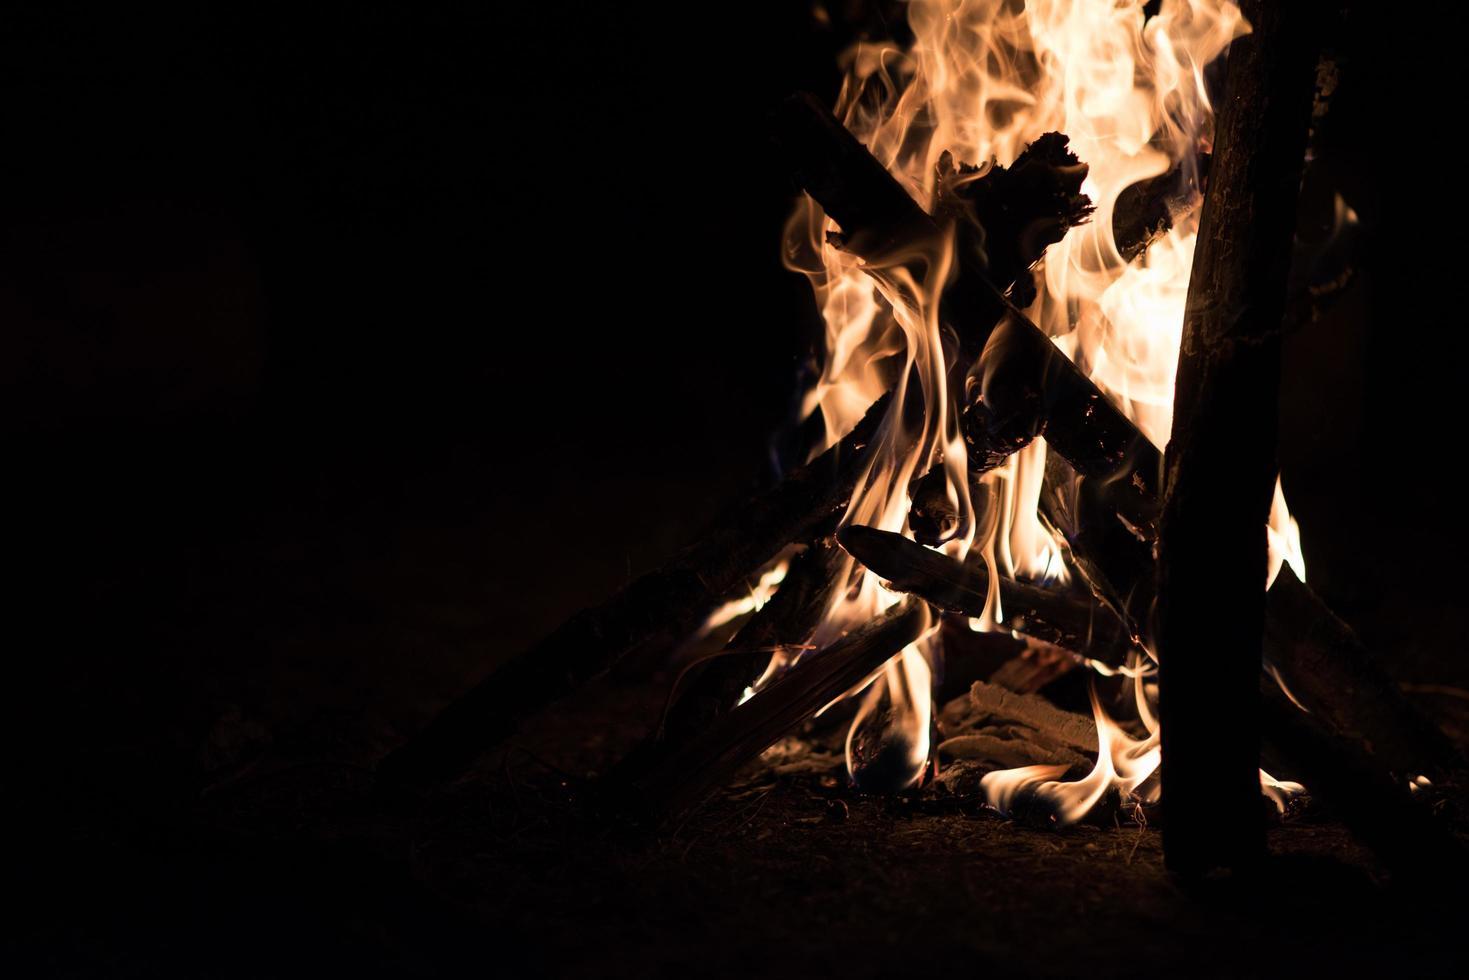 Camp fire in the dark night photo